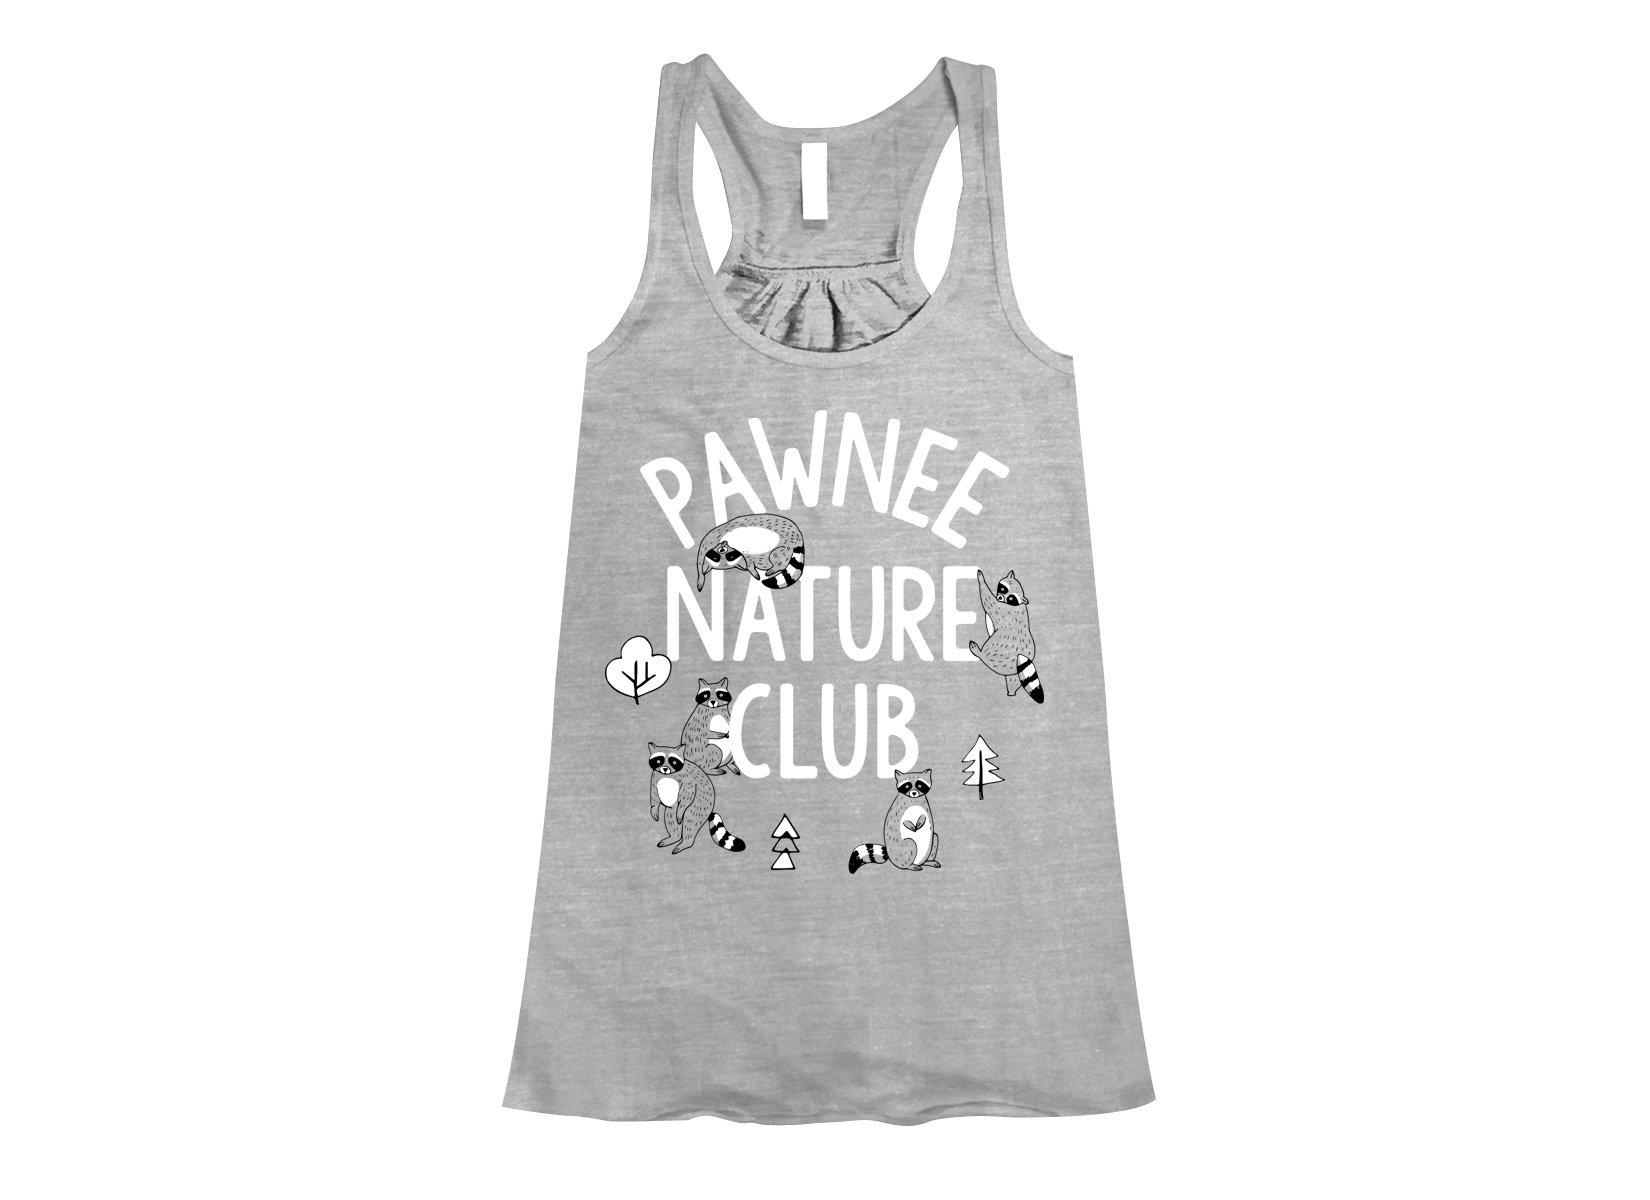 Pawnee Nature Club on Womens Tanks T-Shirt